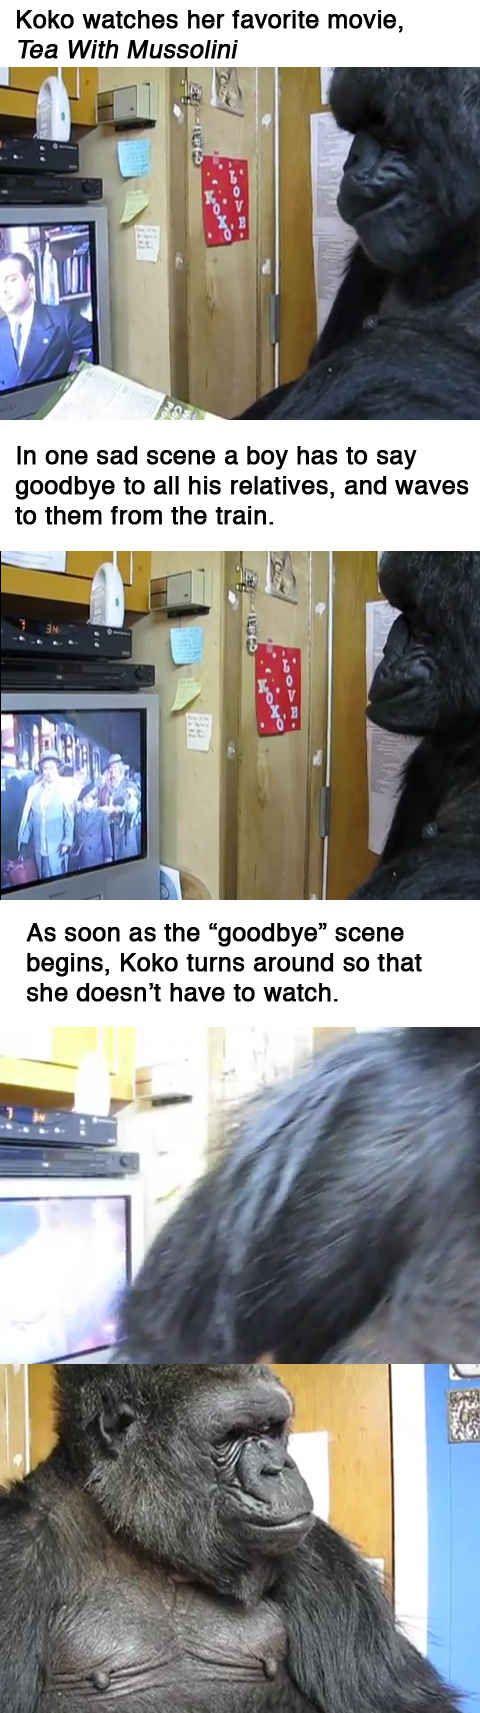 Koko the gorilla responds to a sad moment in her favorite film.